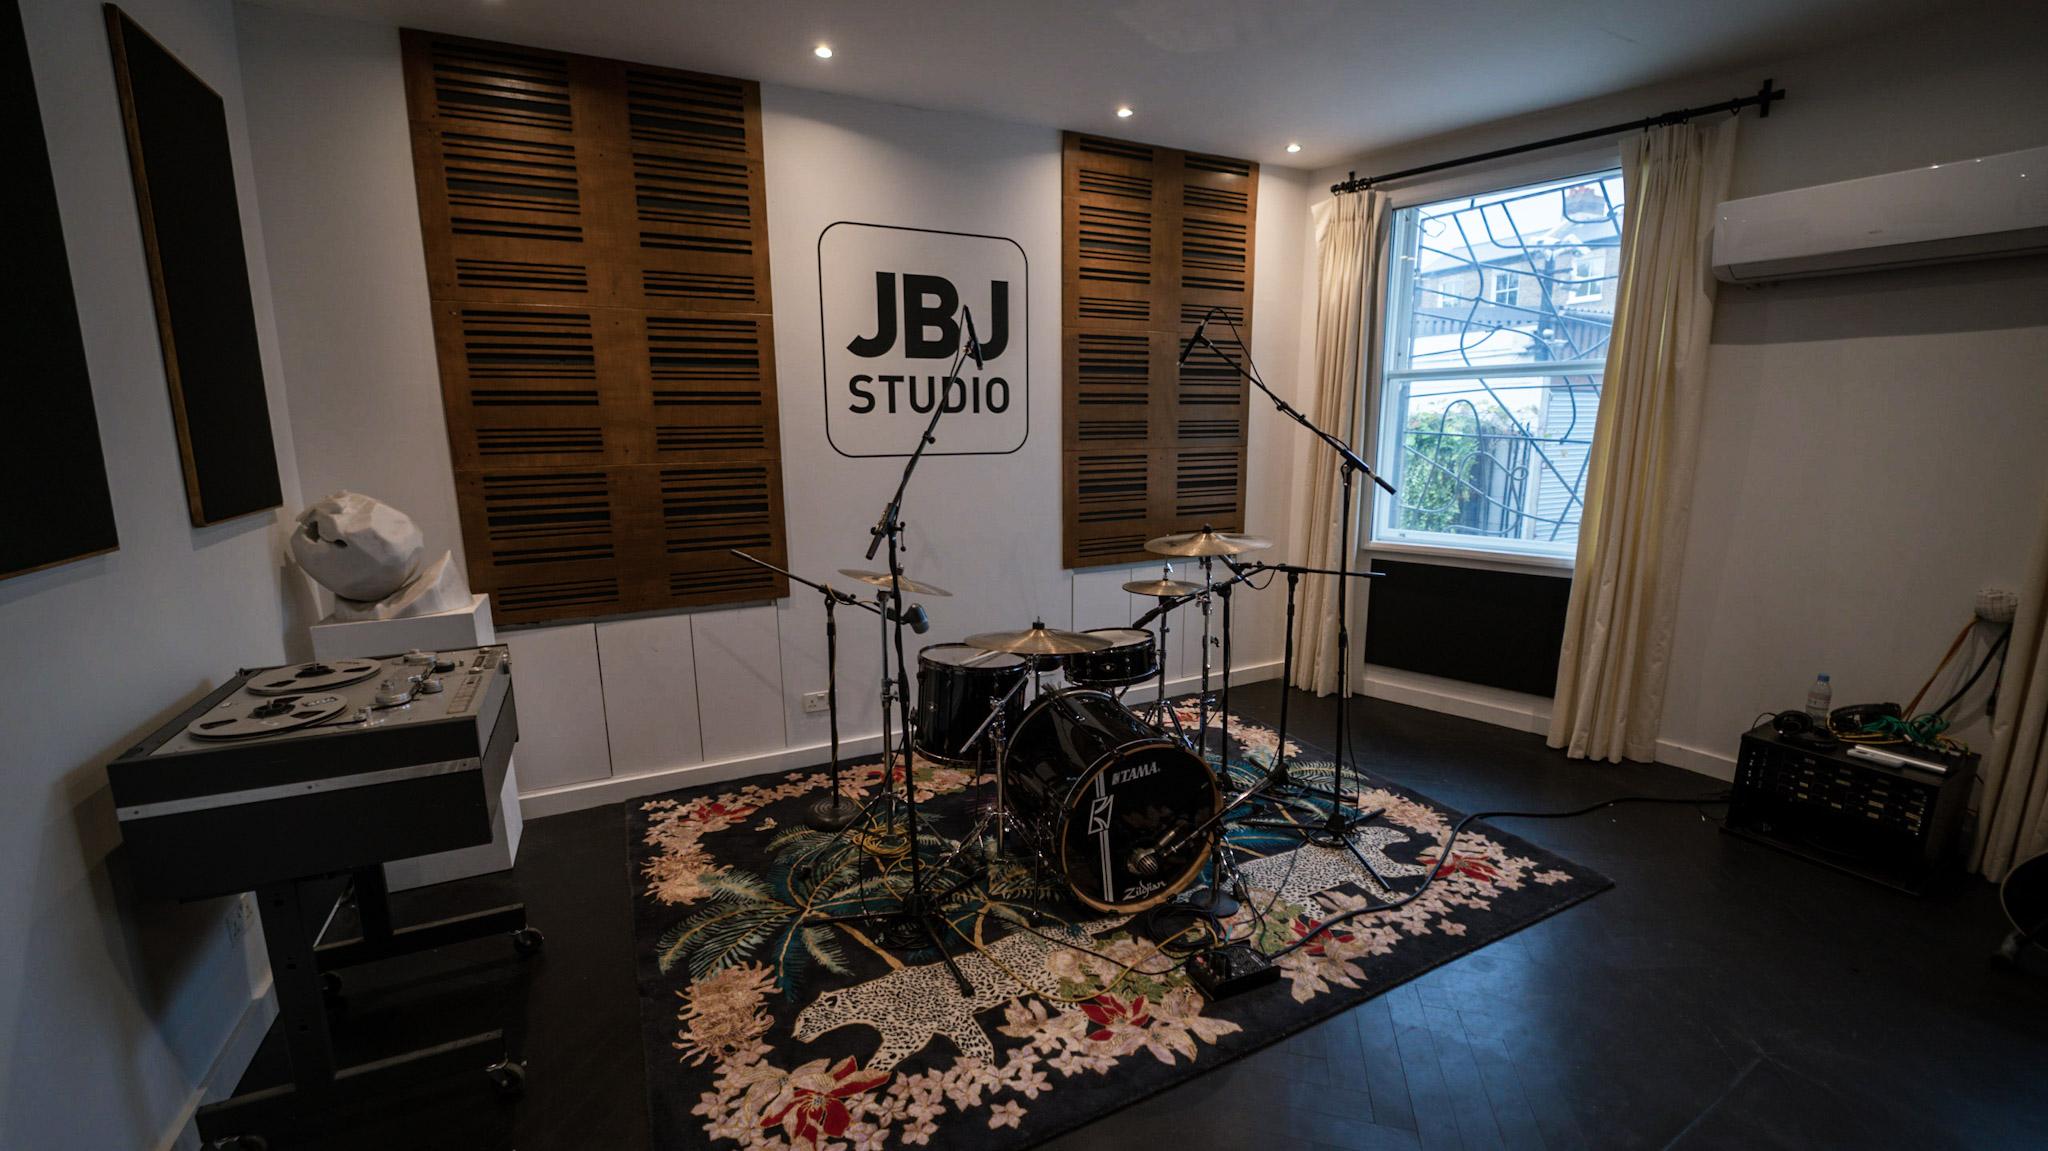 The live room at JBJ studio in Uxbridge